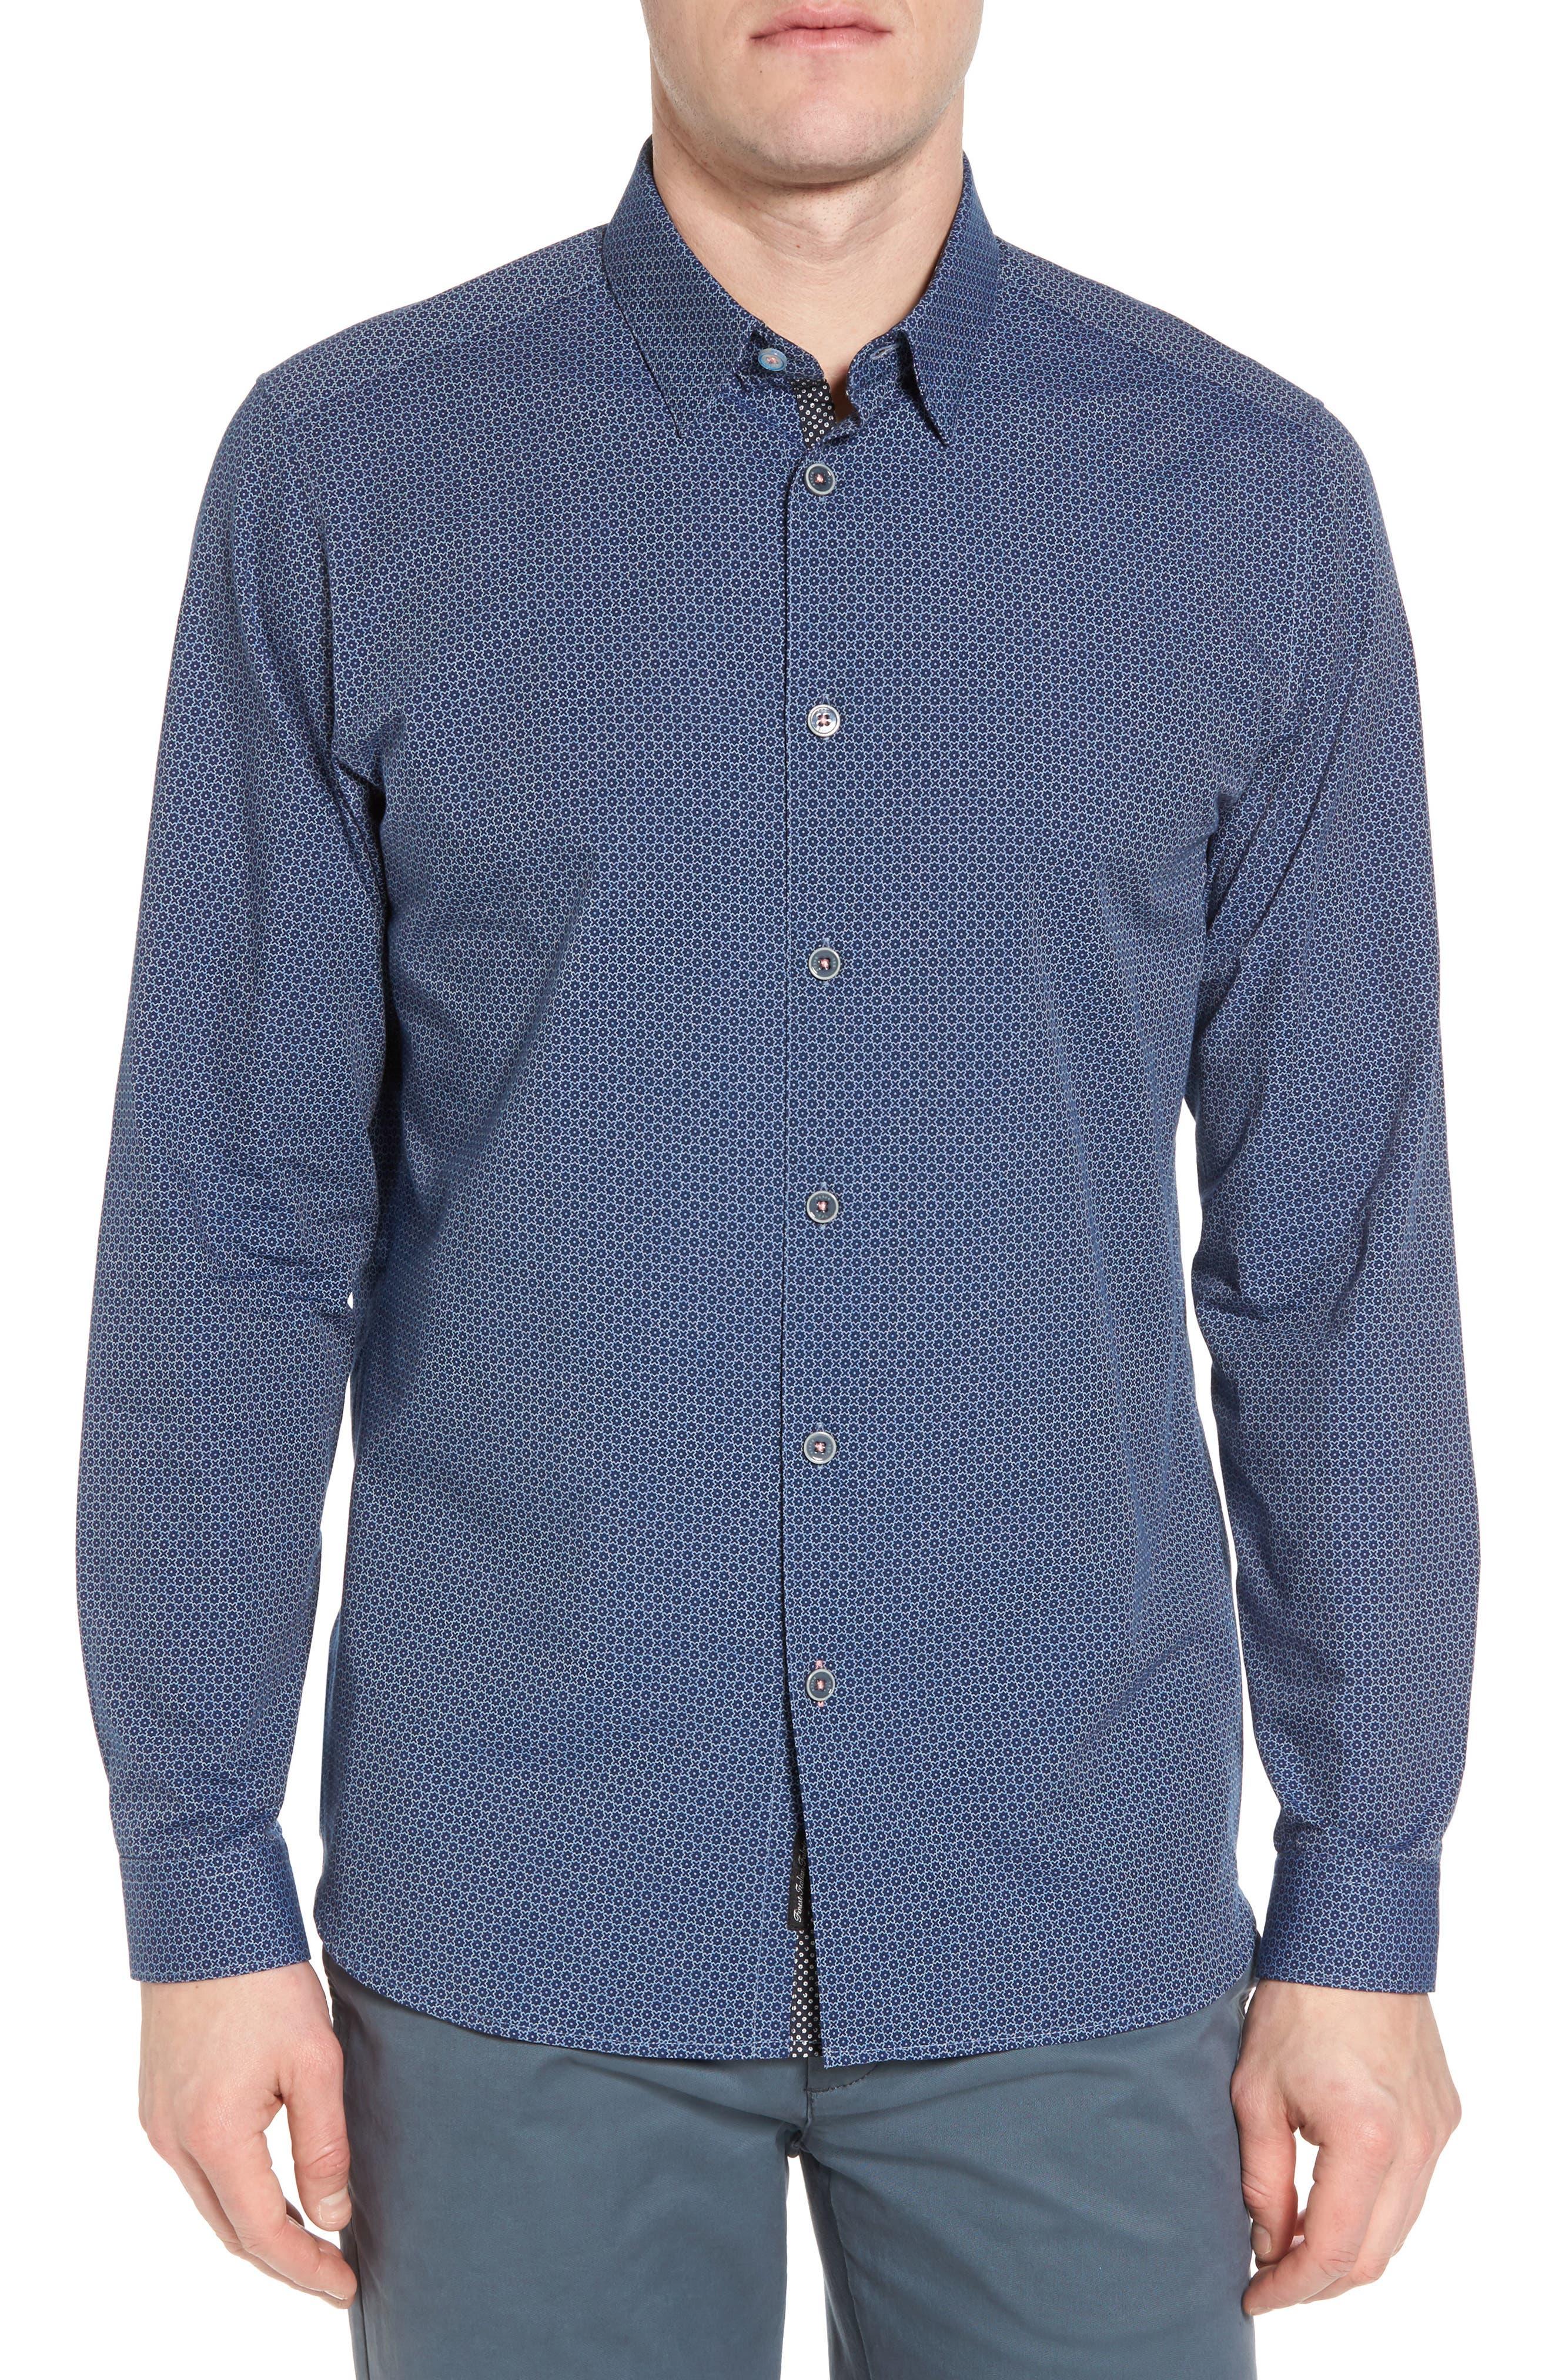 Holic Trim Fit Geometric Sport Shirt,                             Main thumbnail 1, color,                             Blue